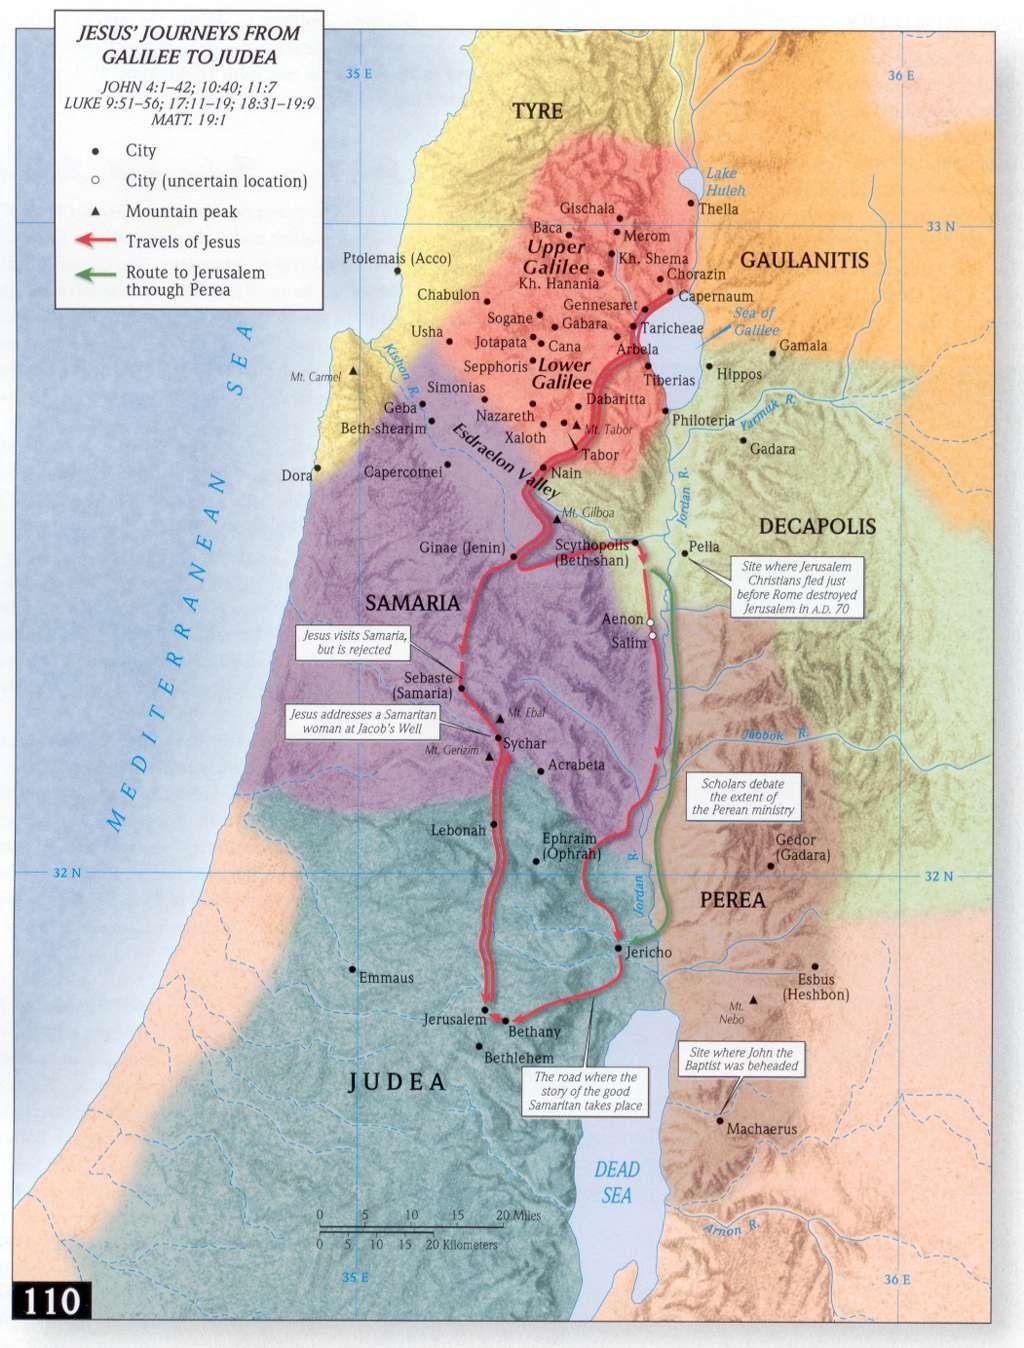 Jesus Journeys from Galilee to Judea Maps